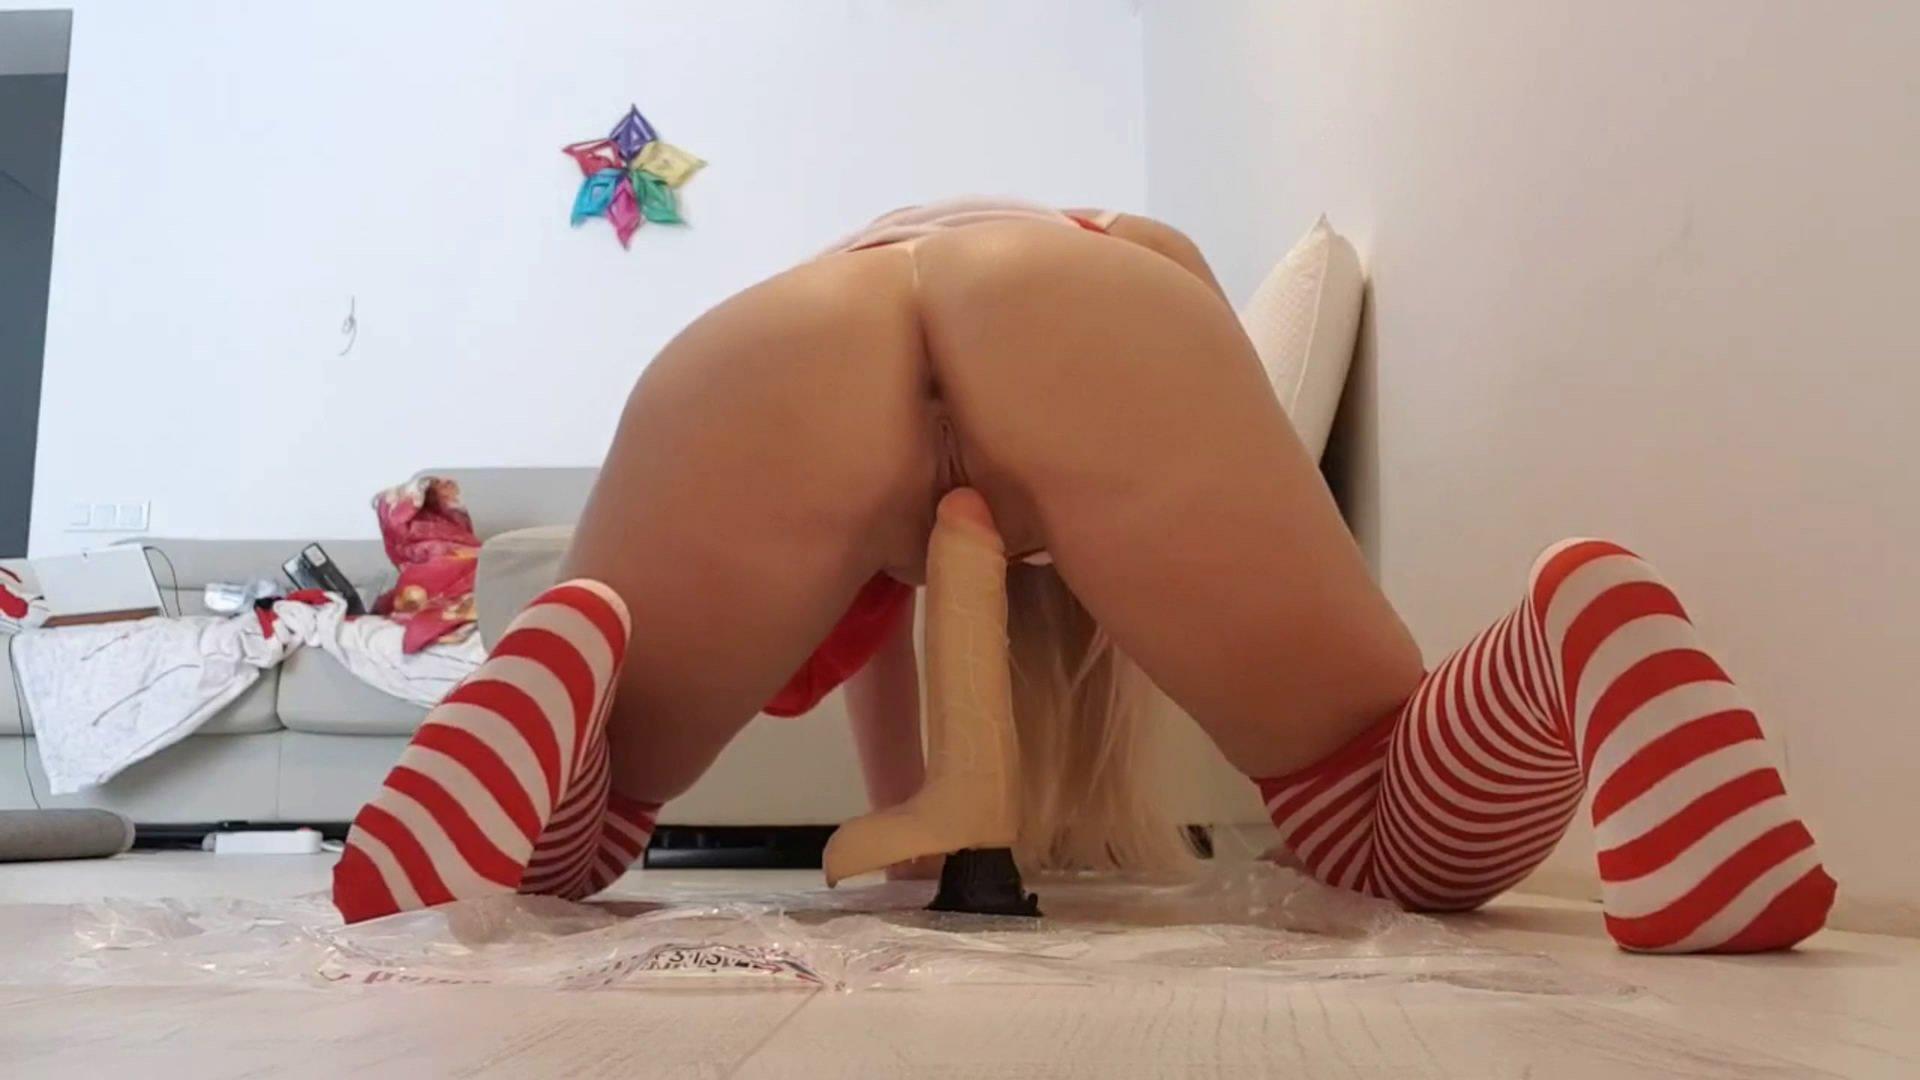 Xmas Cock Messy Punishment – Xmas Red Panties Gift starring in video thefartbabes ($12.99 ScatShop) (Release date: Jun 07, 2021) – Poop Videos